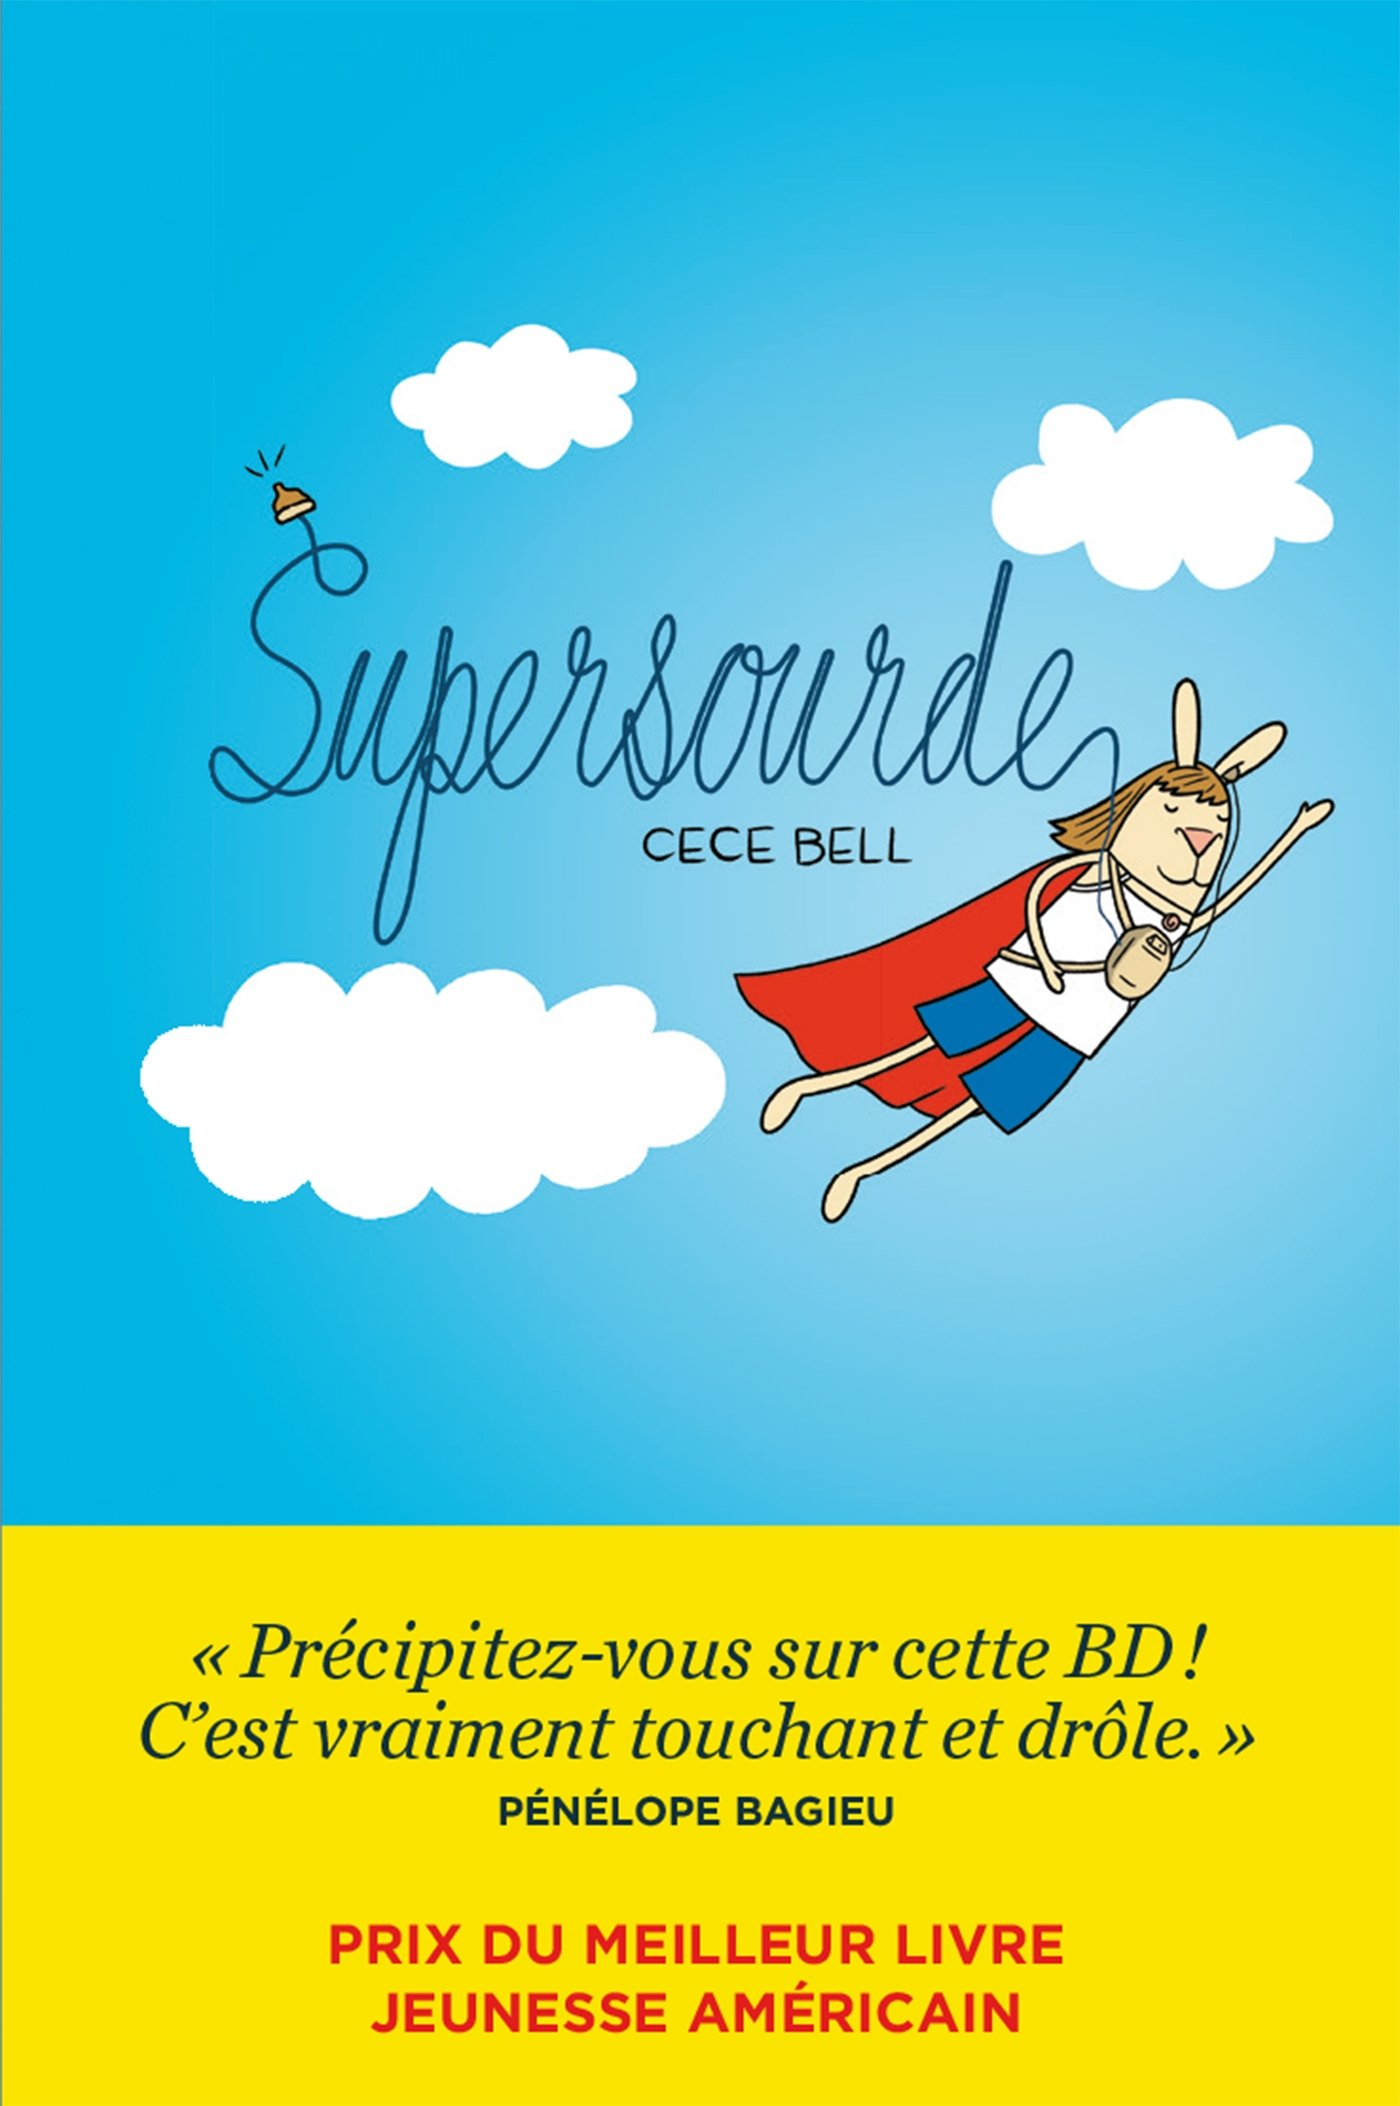 Cece Bell - Supersourde - Couverture